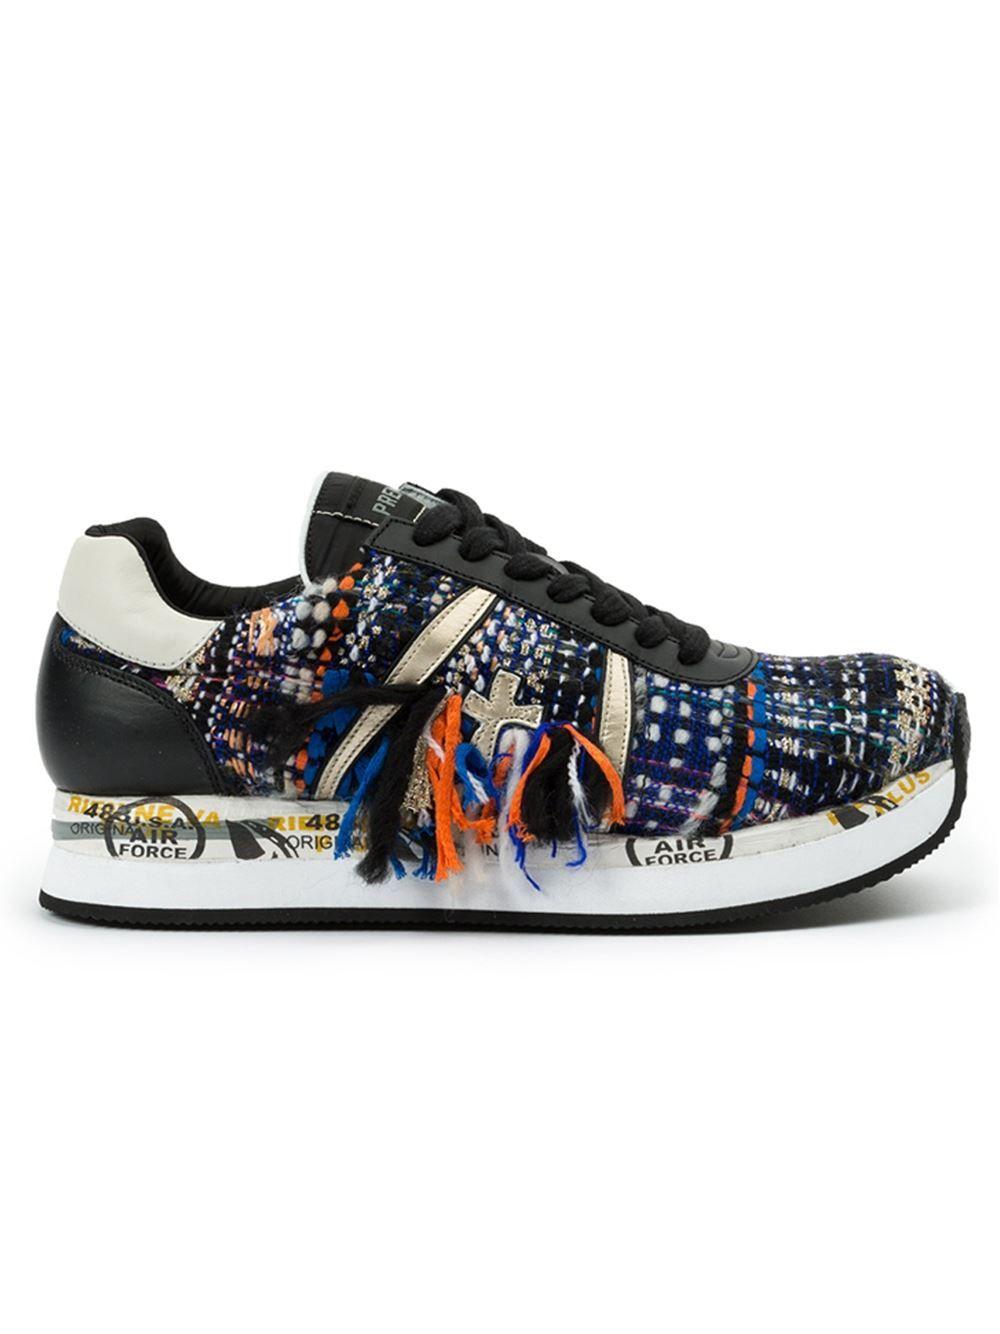 3ffb62af58f premiata #sneakers #woven #women #fashion #style #new www.jofre.eu ...